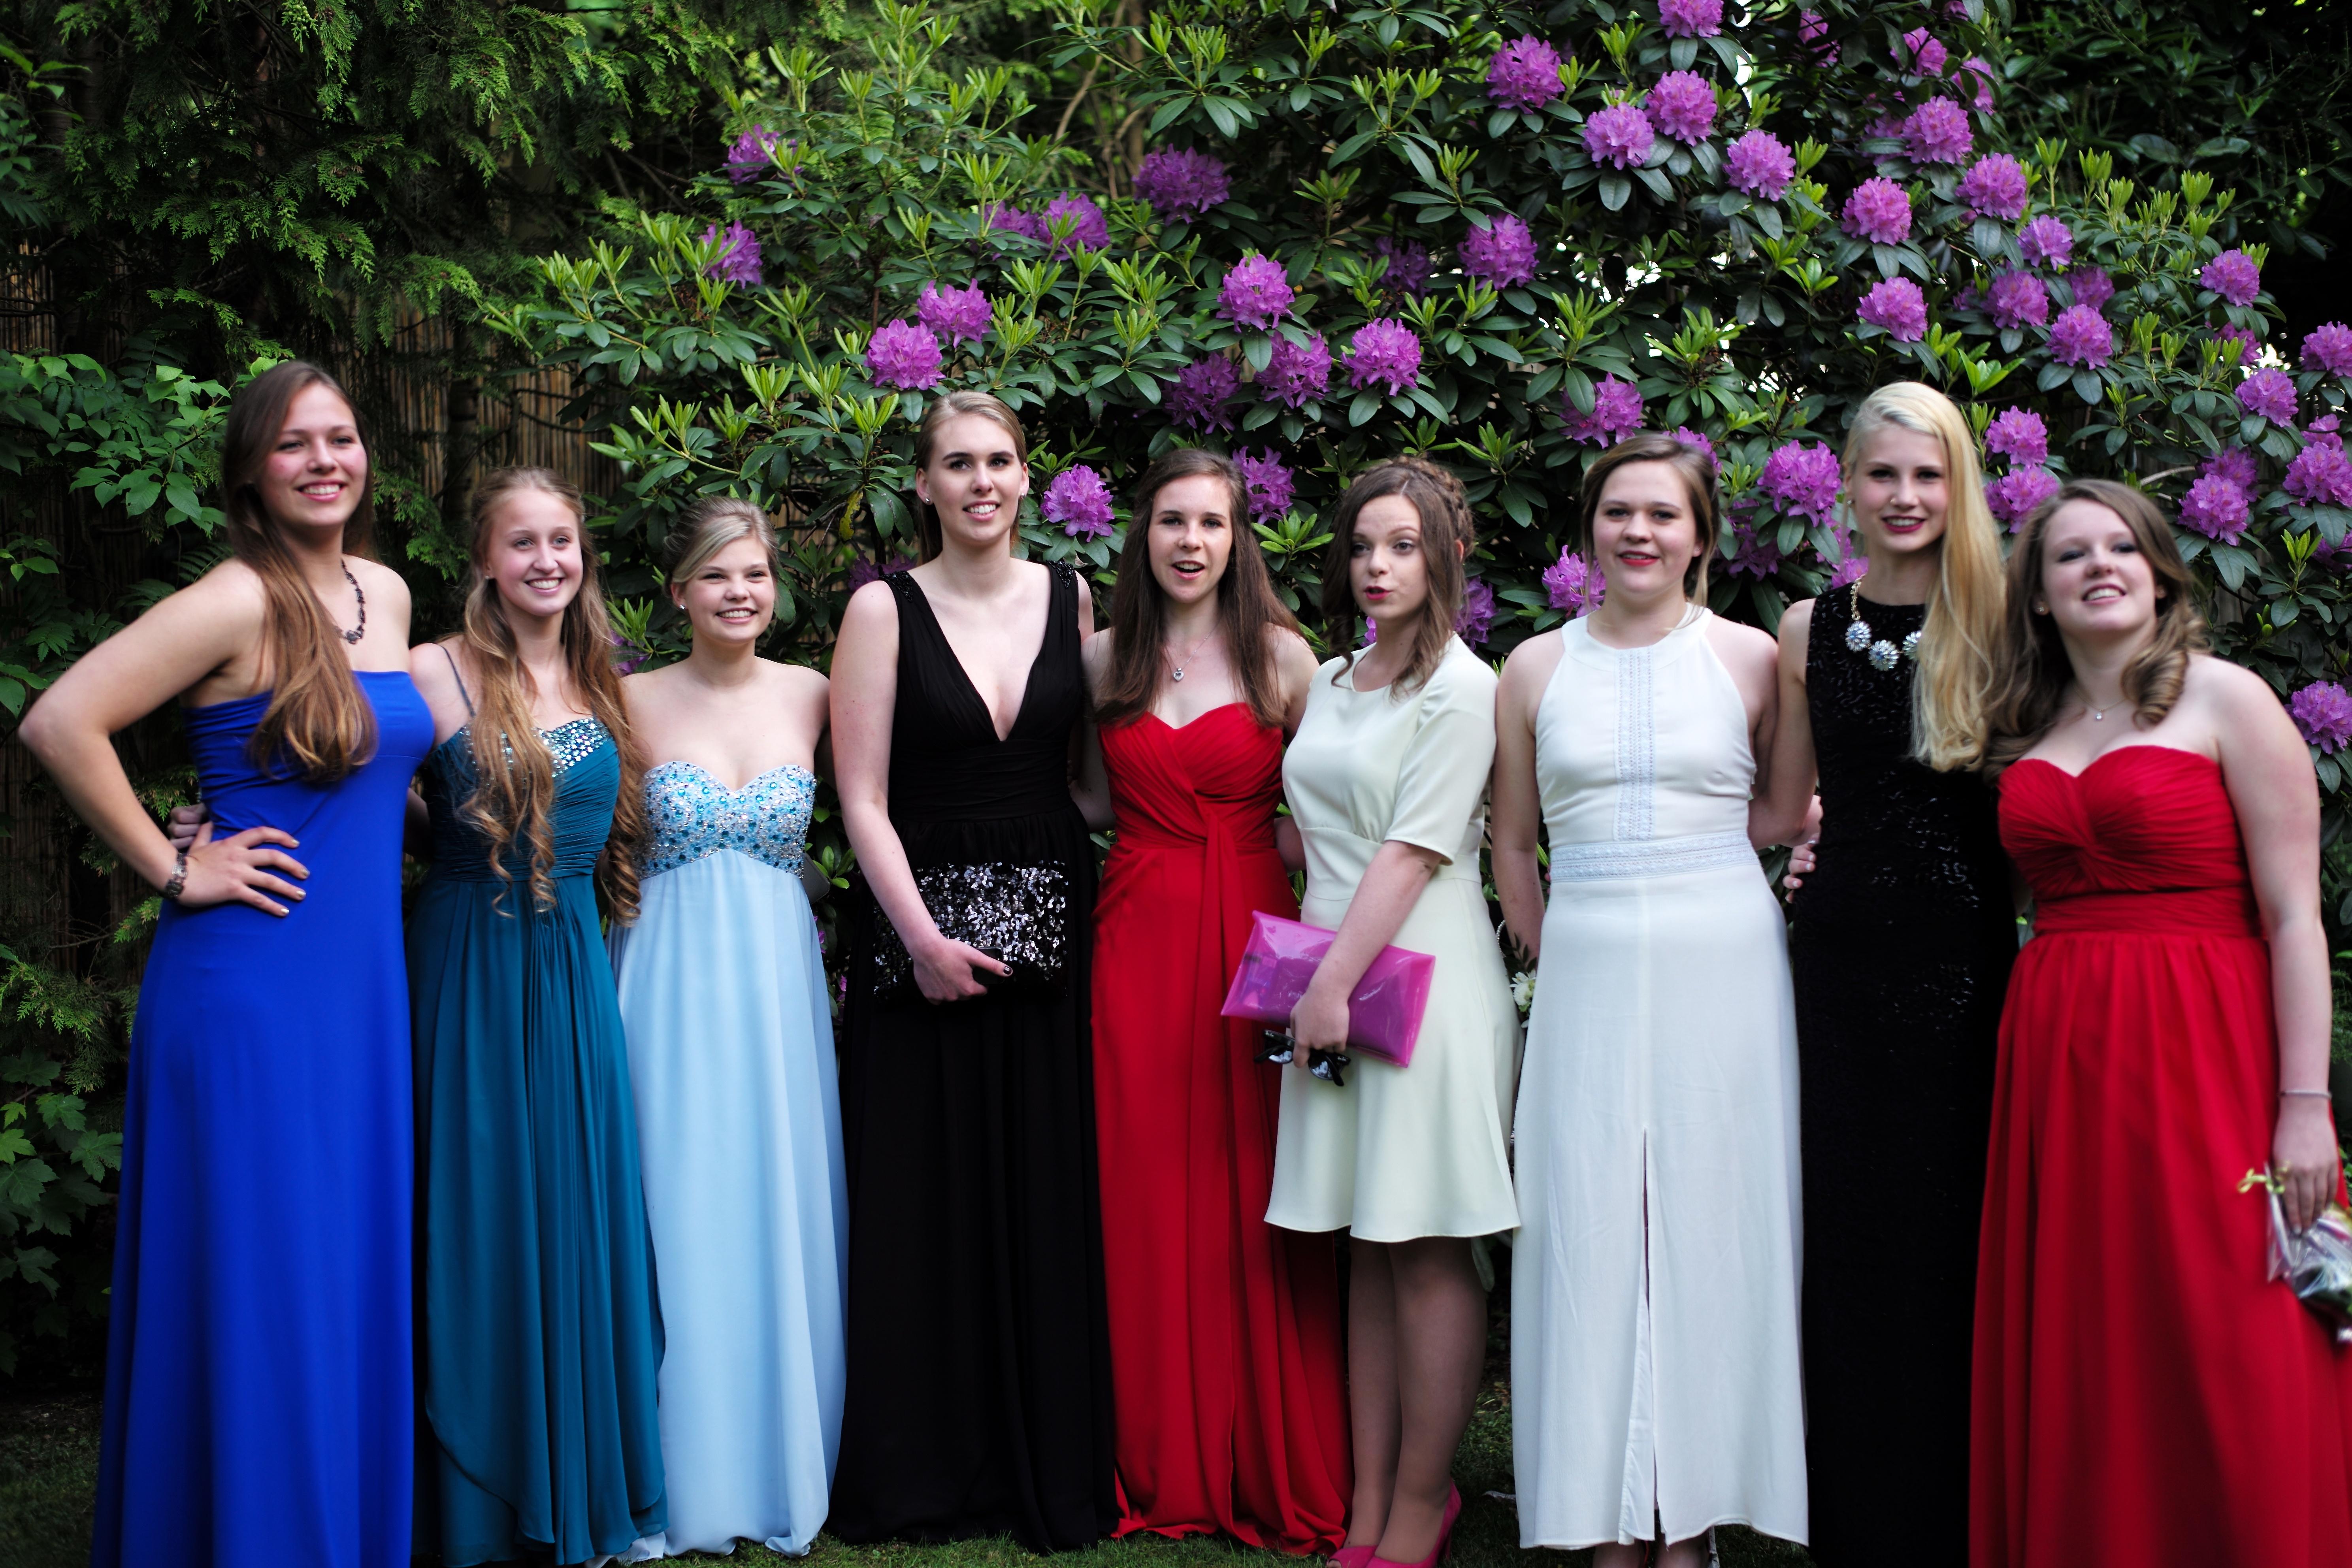 Kostenlose foto : Person, Gruppe, Frau, Europa, Porträt, Frühling ...